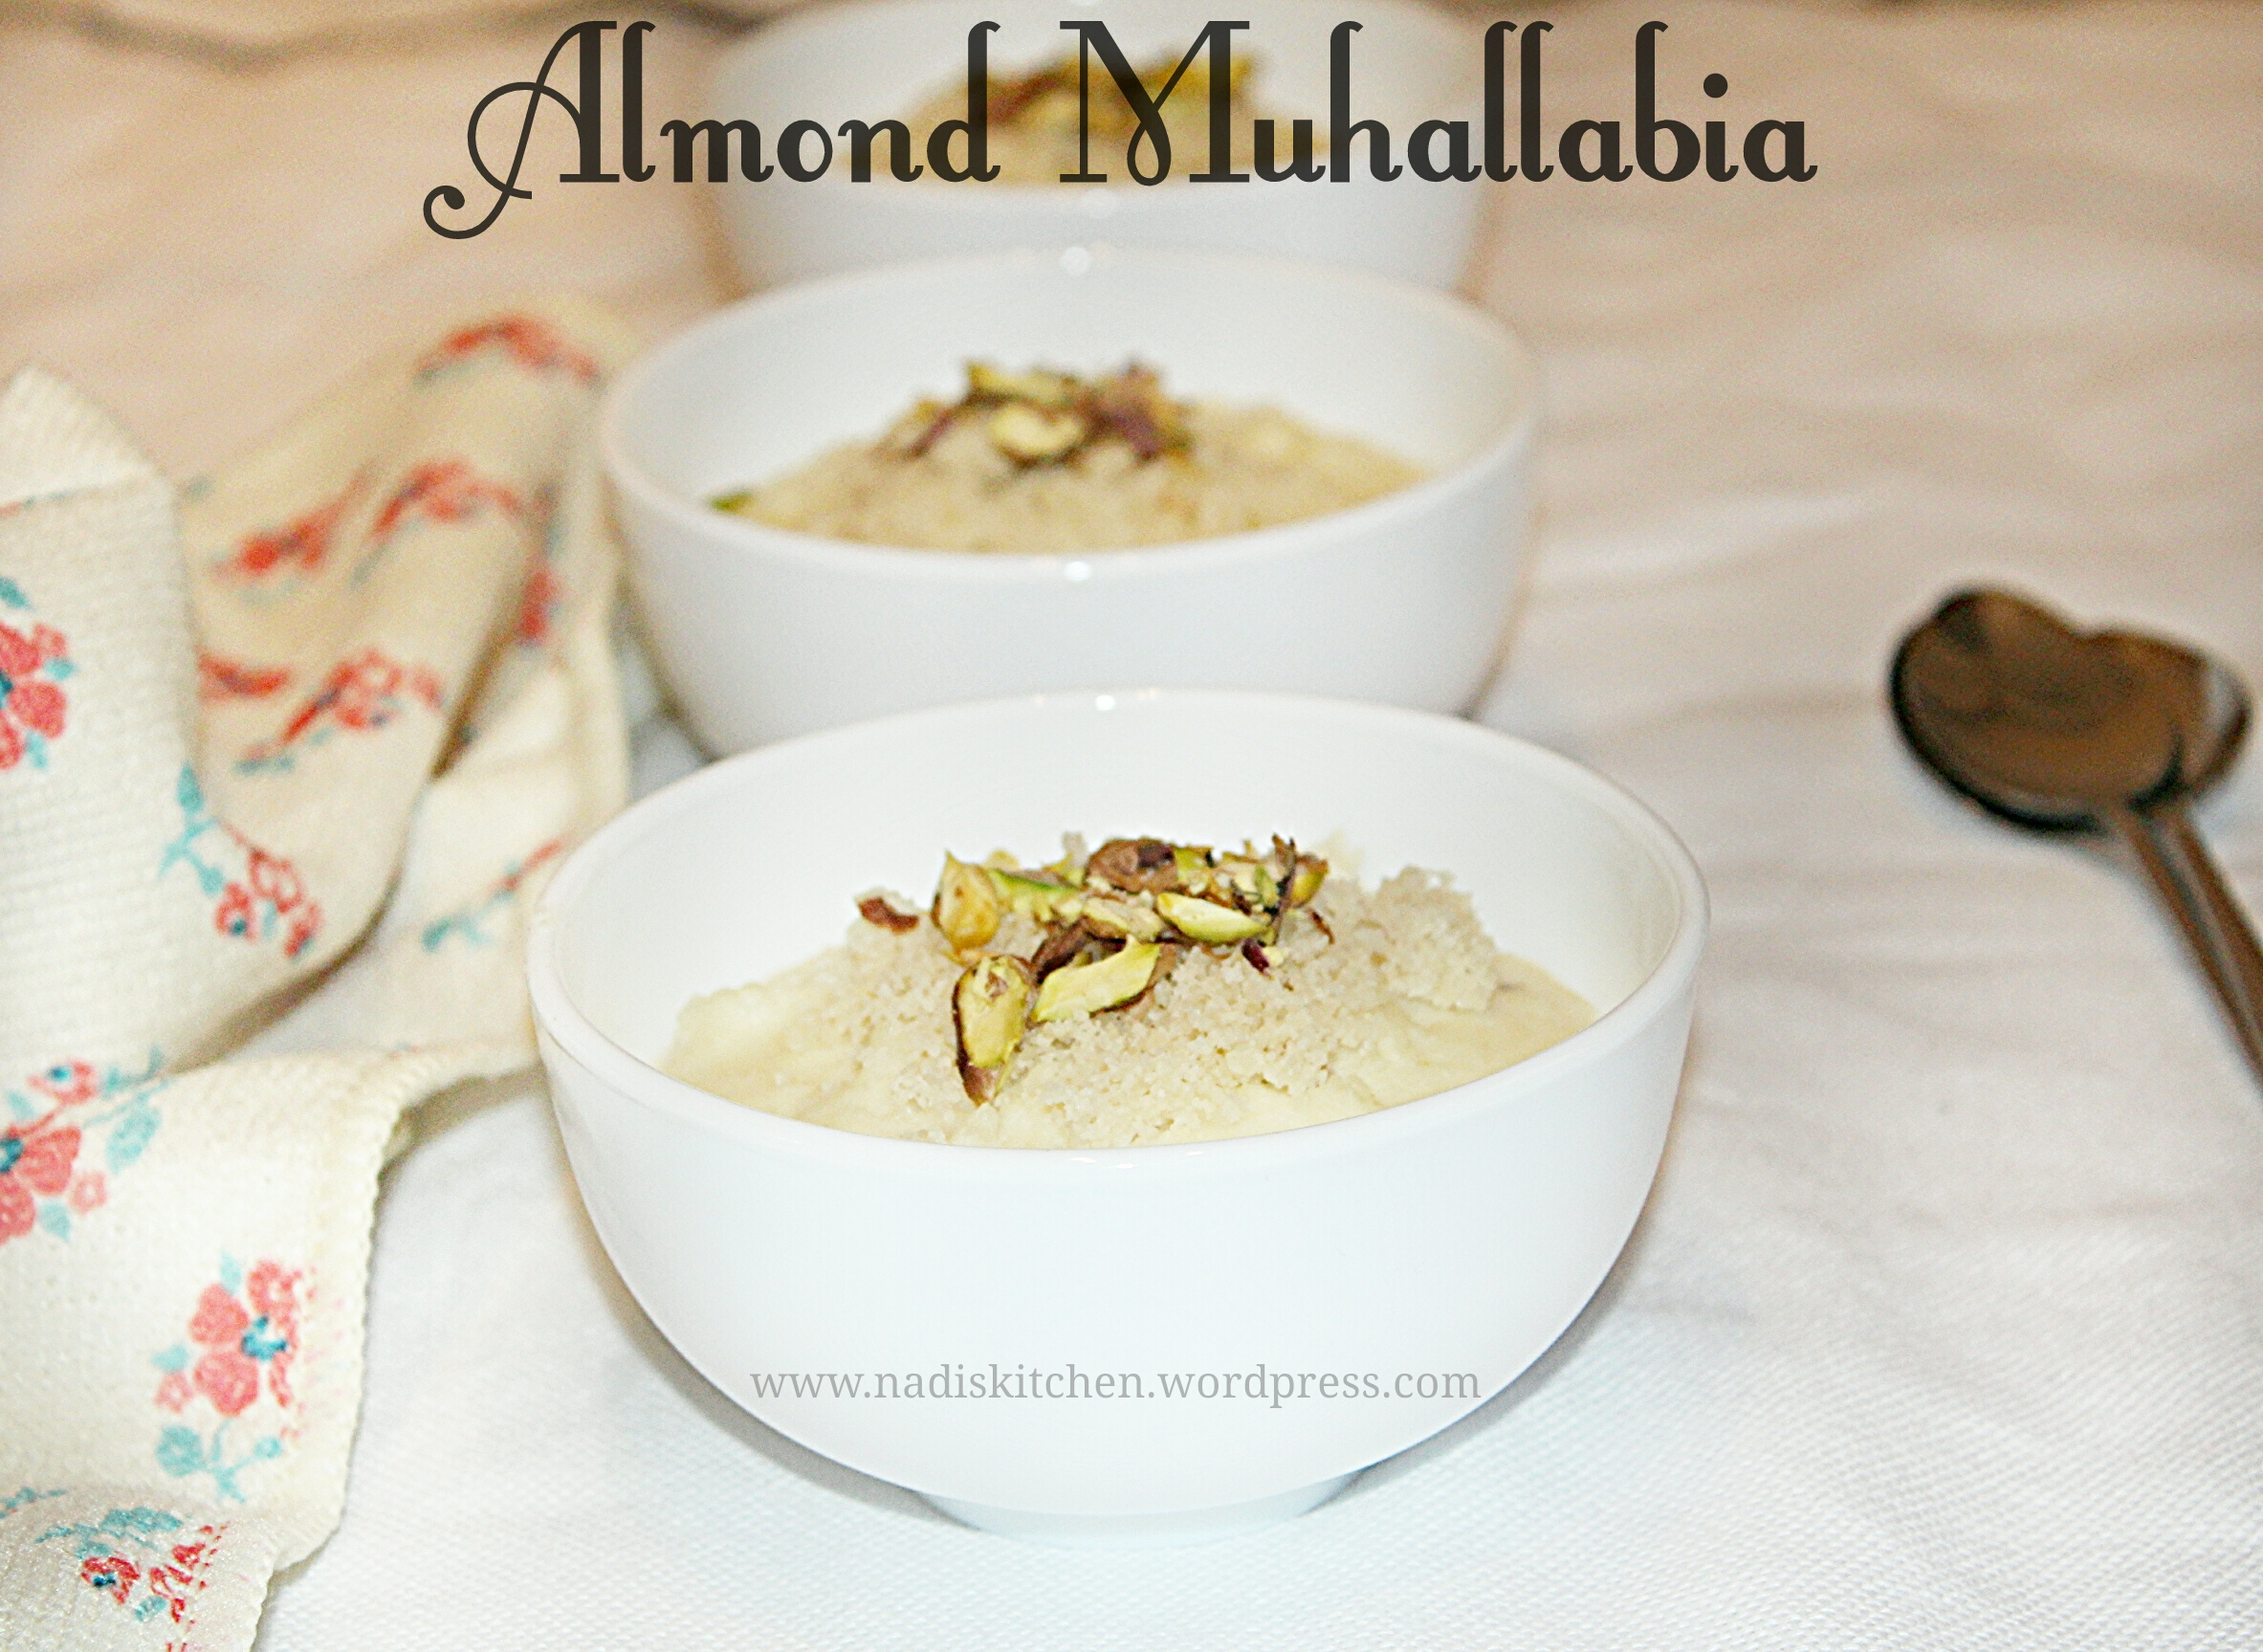 Almond Muhallabia (Middle Eastern Dessert)